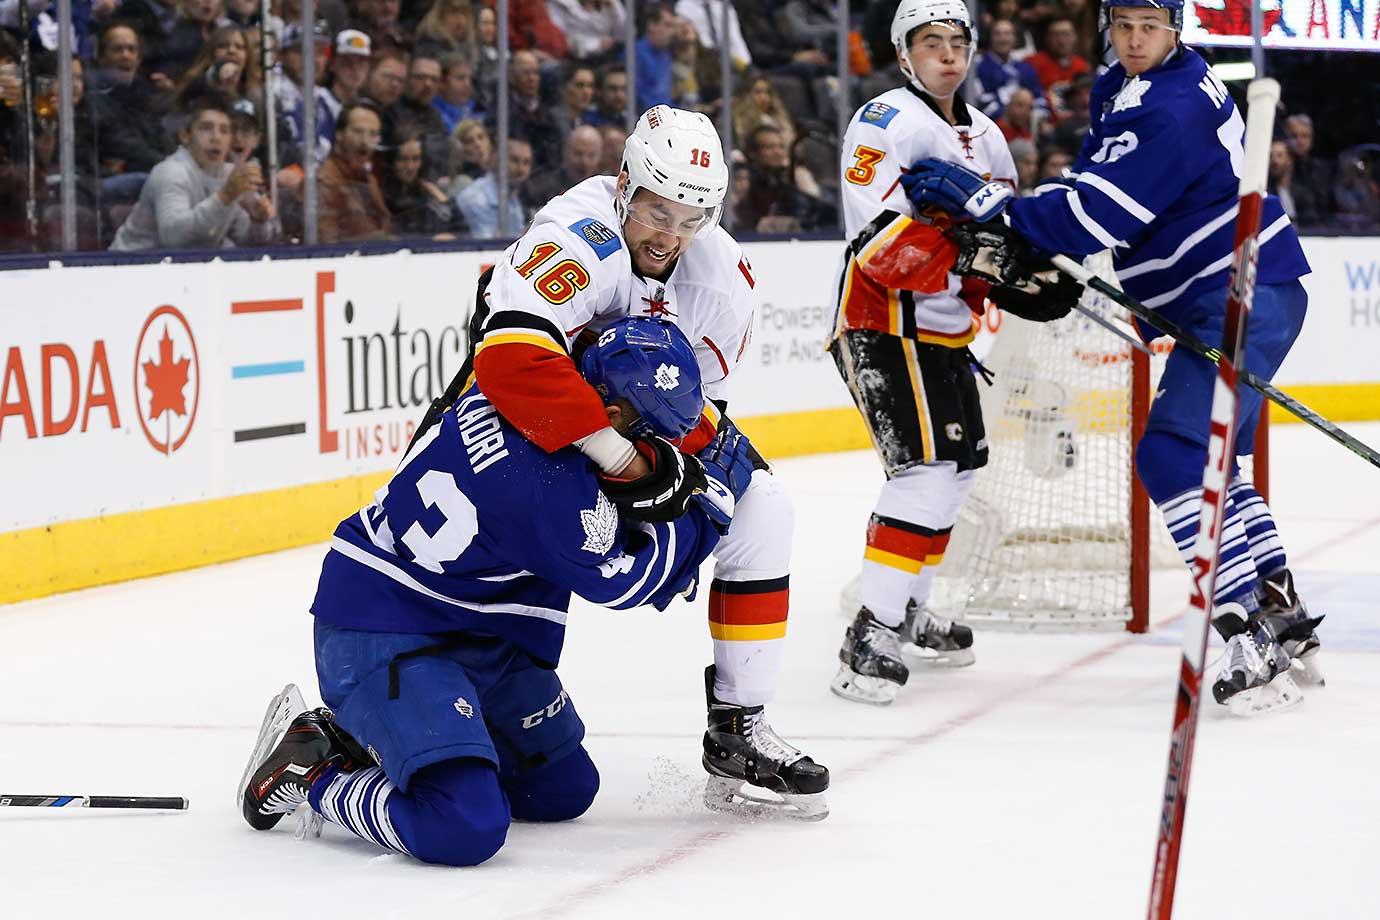 Calgary's Josh Jooris puts Toronto Maple Leafs center Nazem Kadri into a headlock.